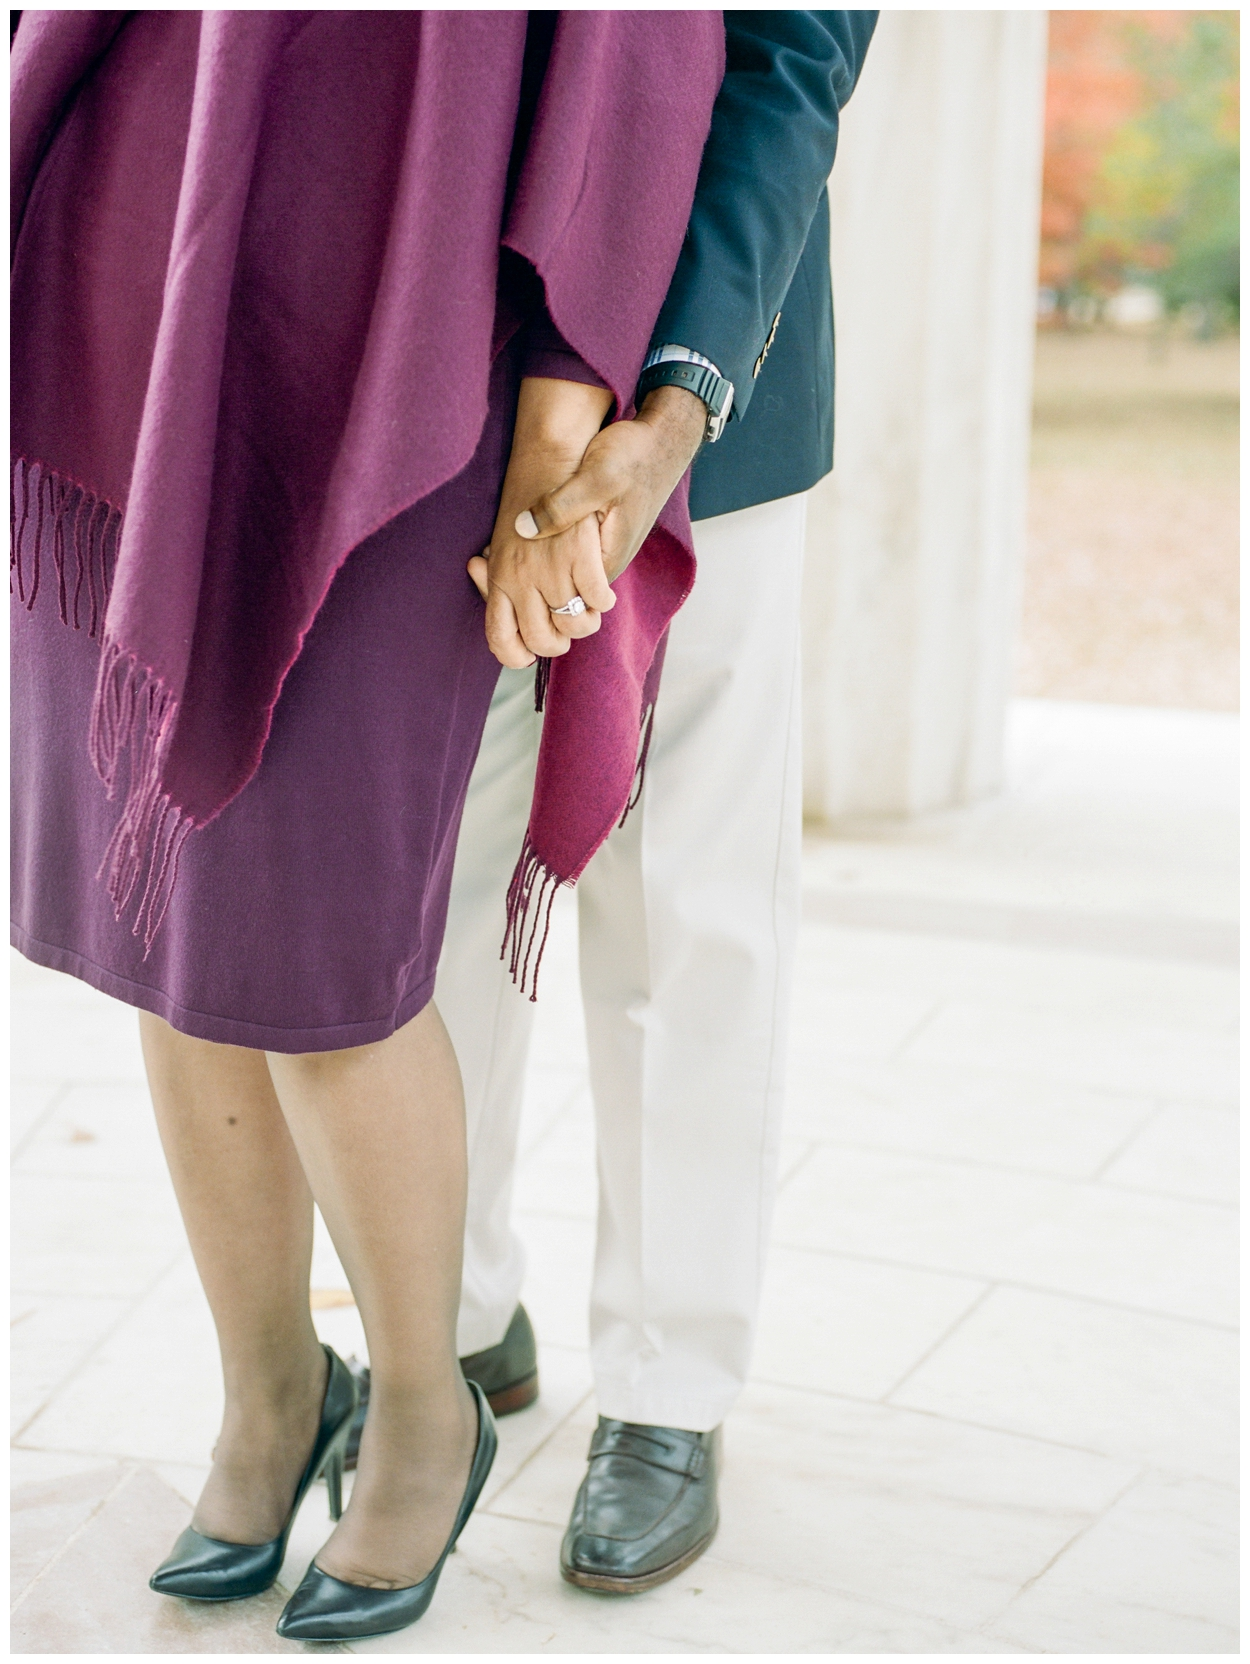 fall washington dc engagement session by fine art film wedding photographer Lissa Ryan Photography